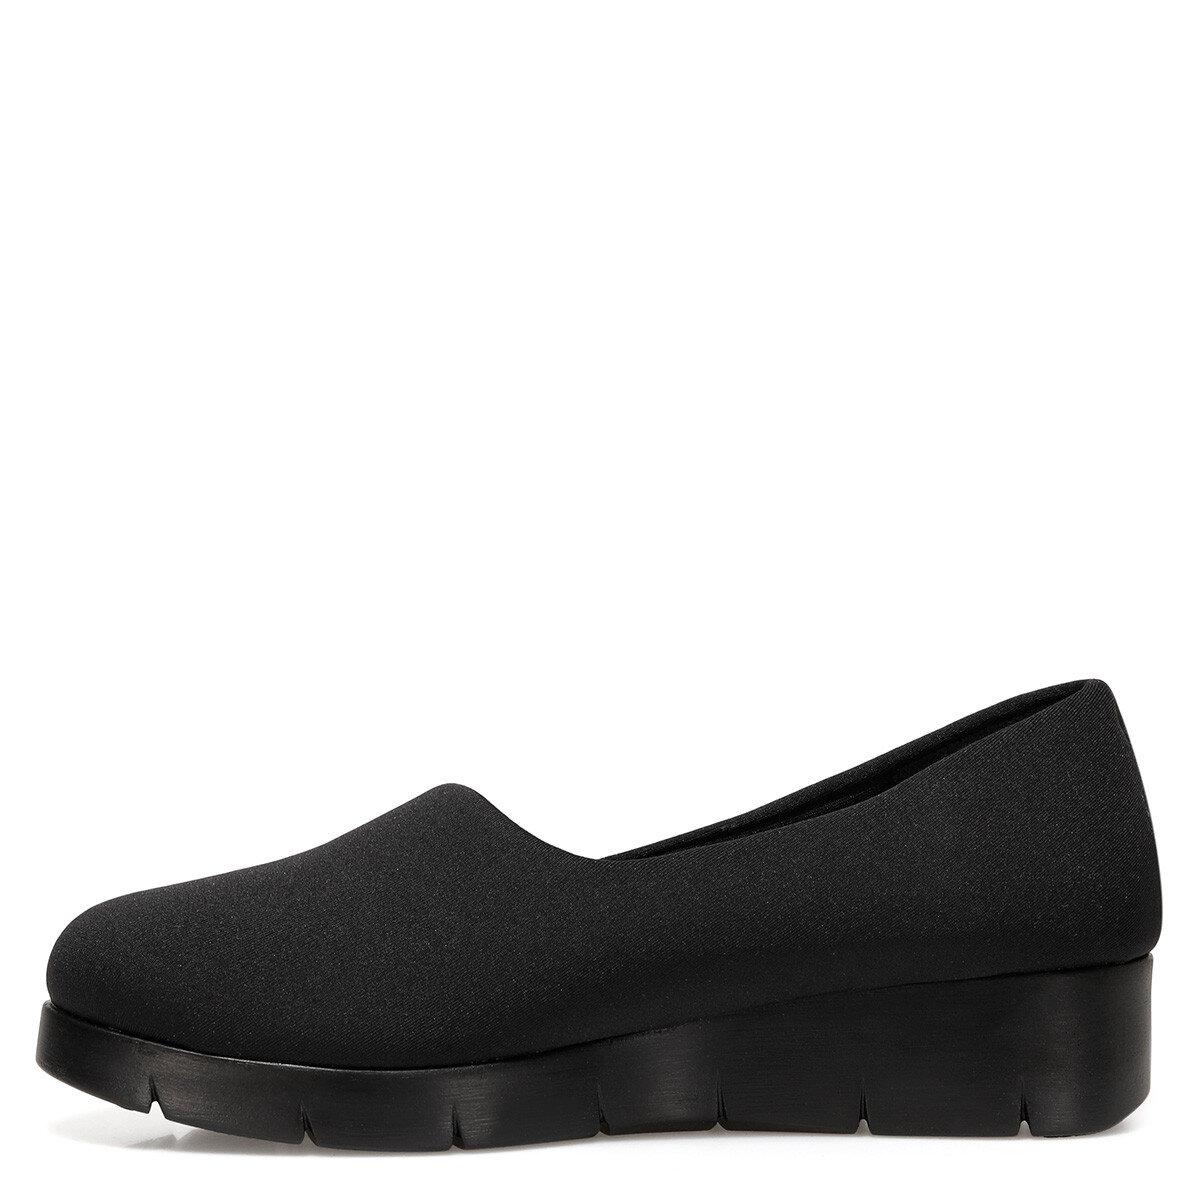 FALAW Siyah Kadın Dolgu Topuk Ayakkabı